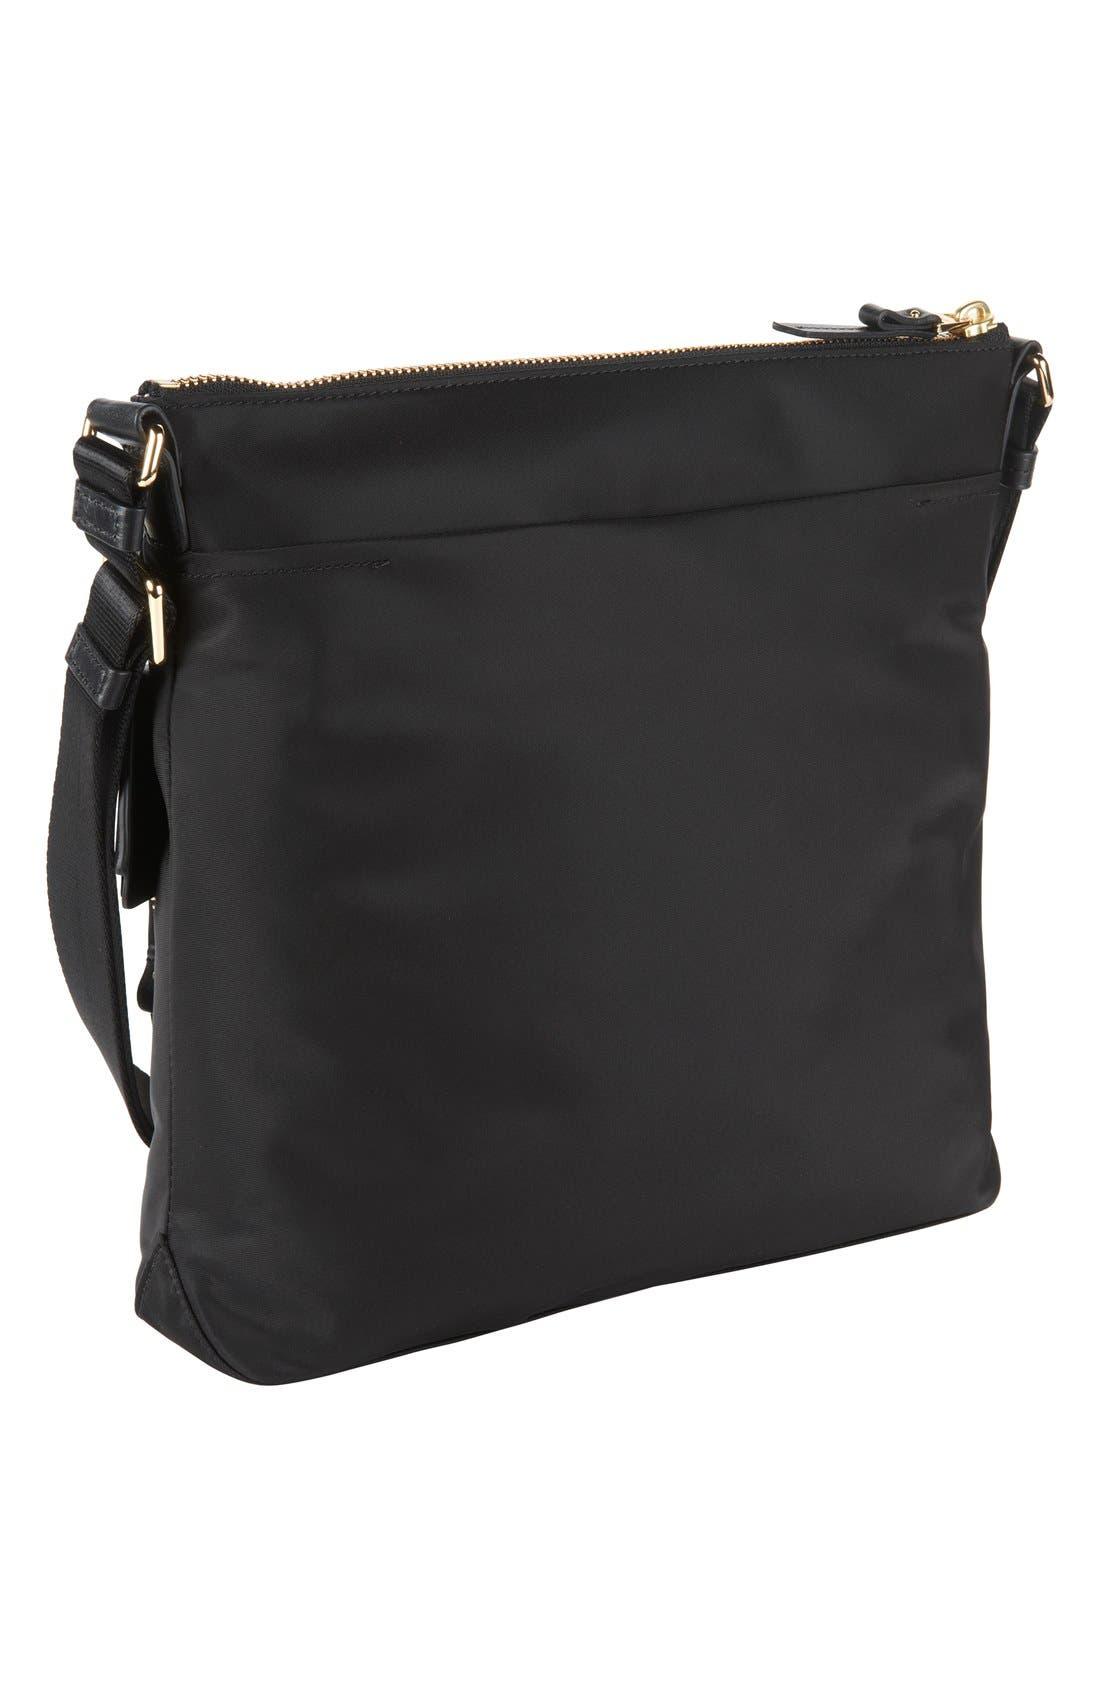 Alternate Image 3  - Tumi 'Voyageur - Capri' Nylon Crossbody Bag